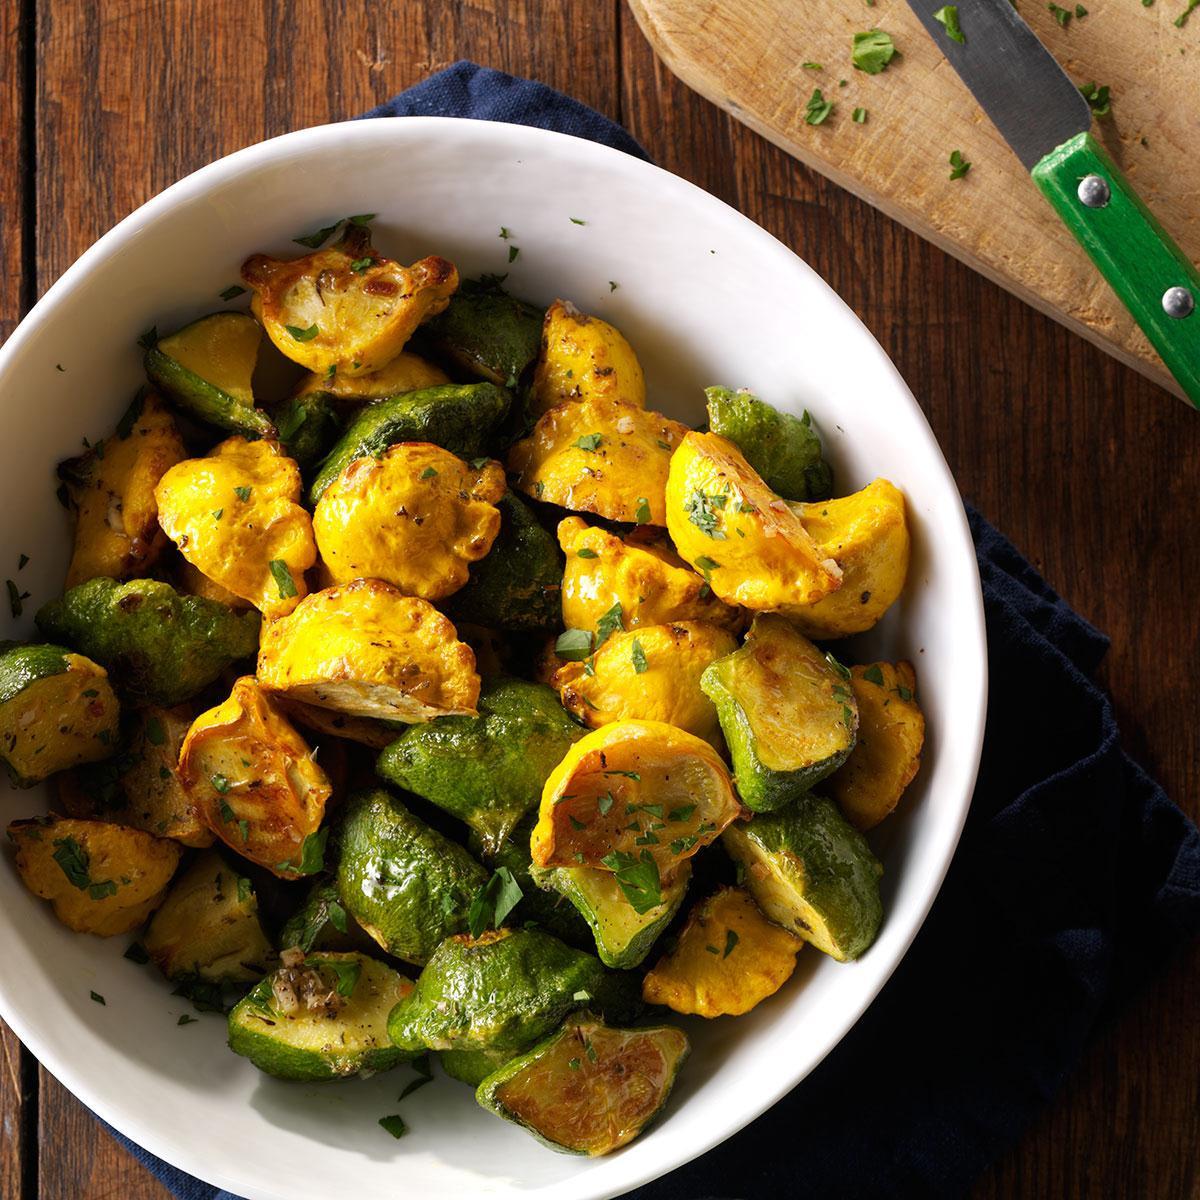 Summer Squash Recipes  Garlic Herb Pattypan Squash Recipe